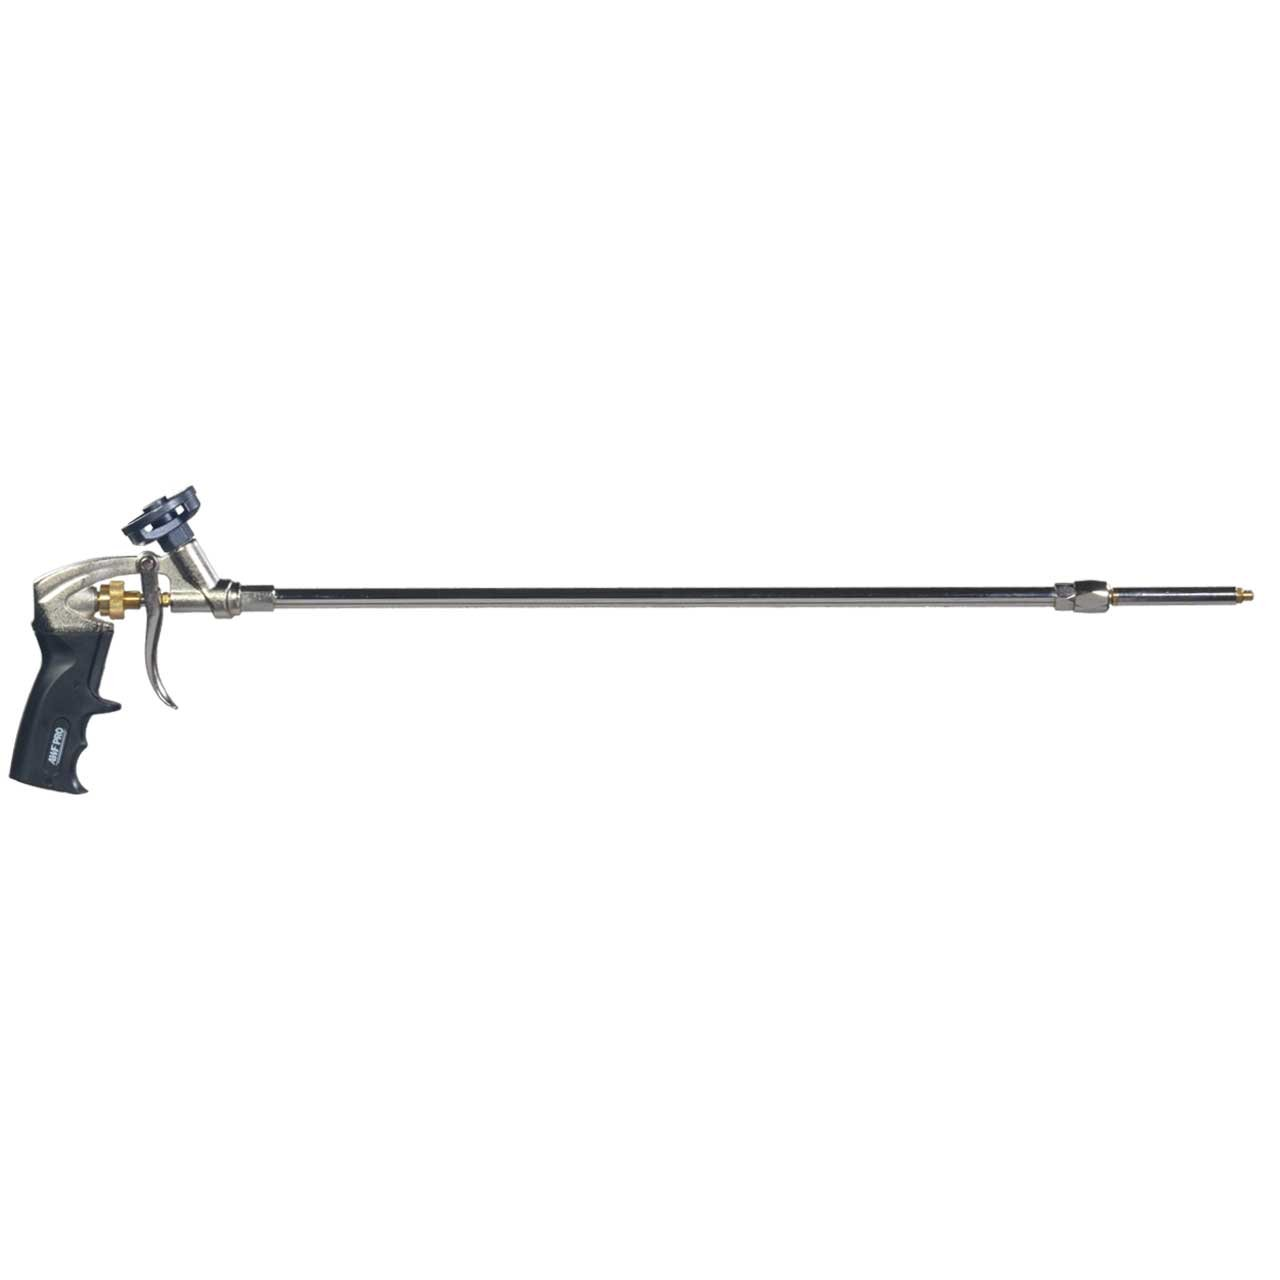 AWF Pro Barrel 60 cm 2 ft Pro Foam Gun Swivel Tip One Hand Adjustment